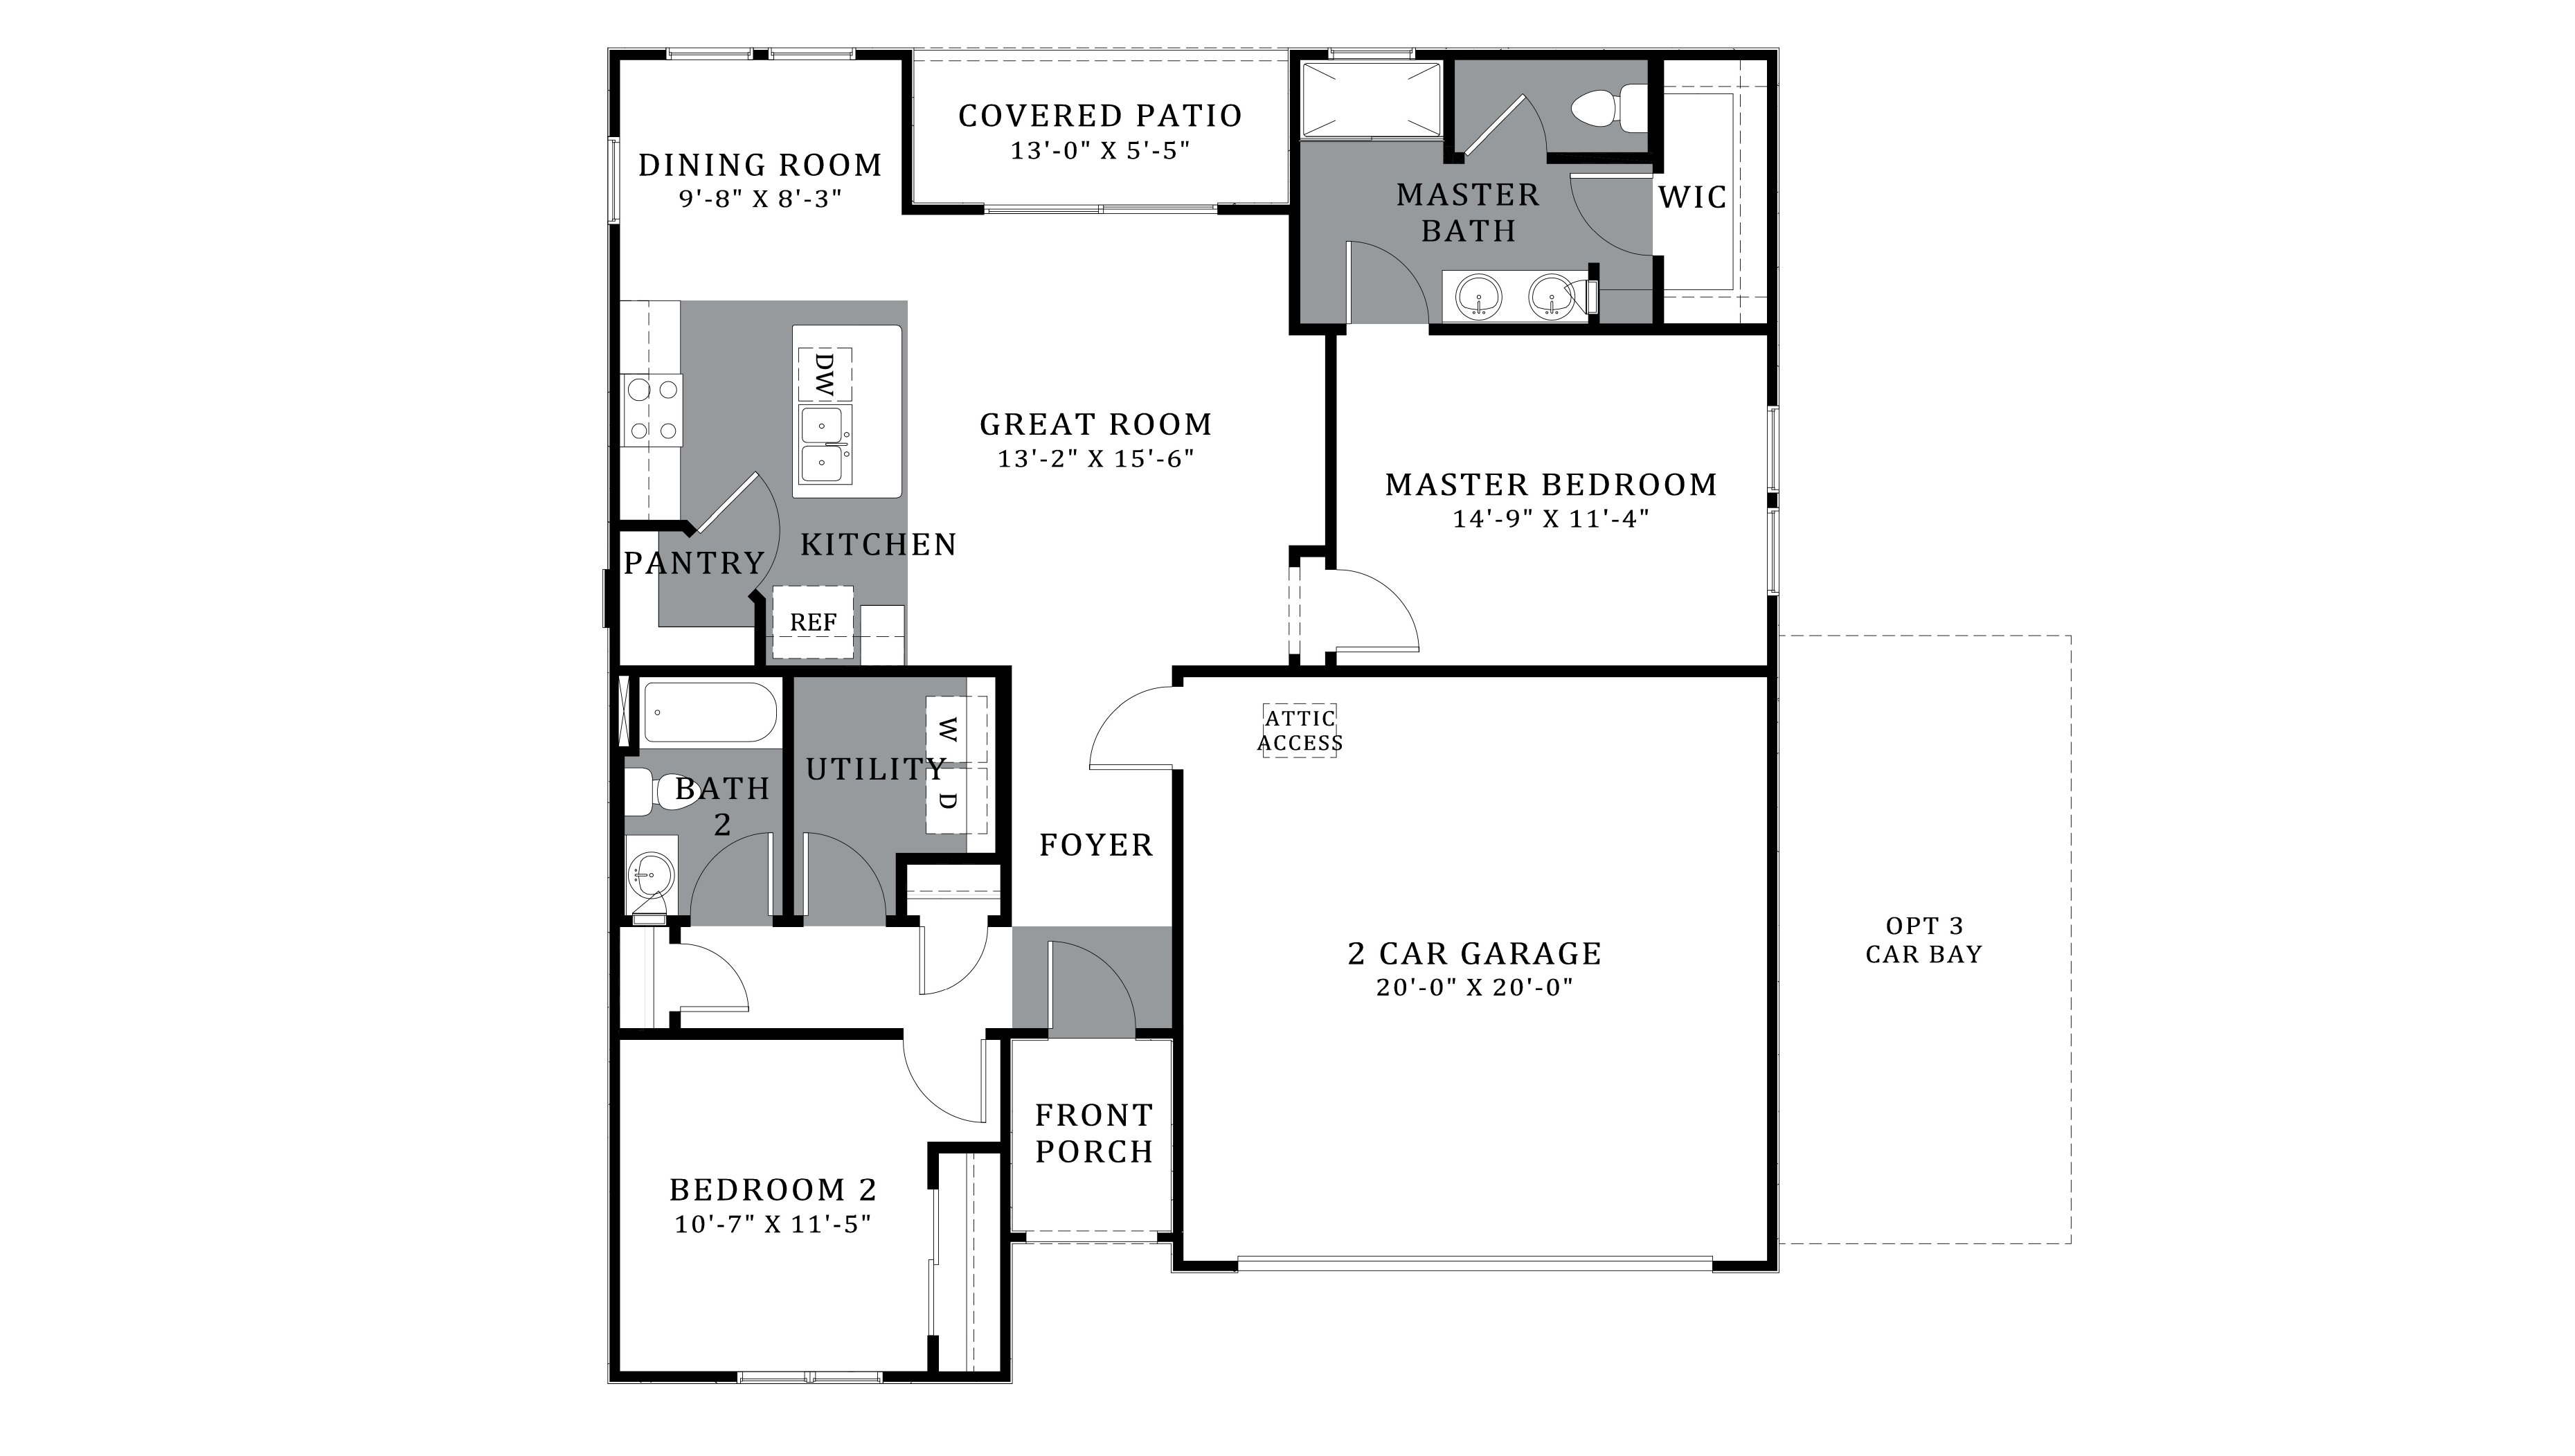 D.R. Horton Saguaro Bloom Freedom Earhart - Plan 1200 Floor Plan